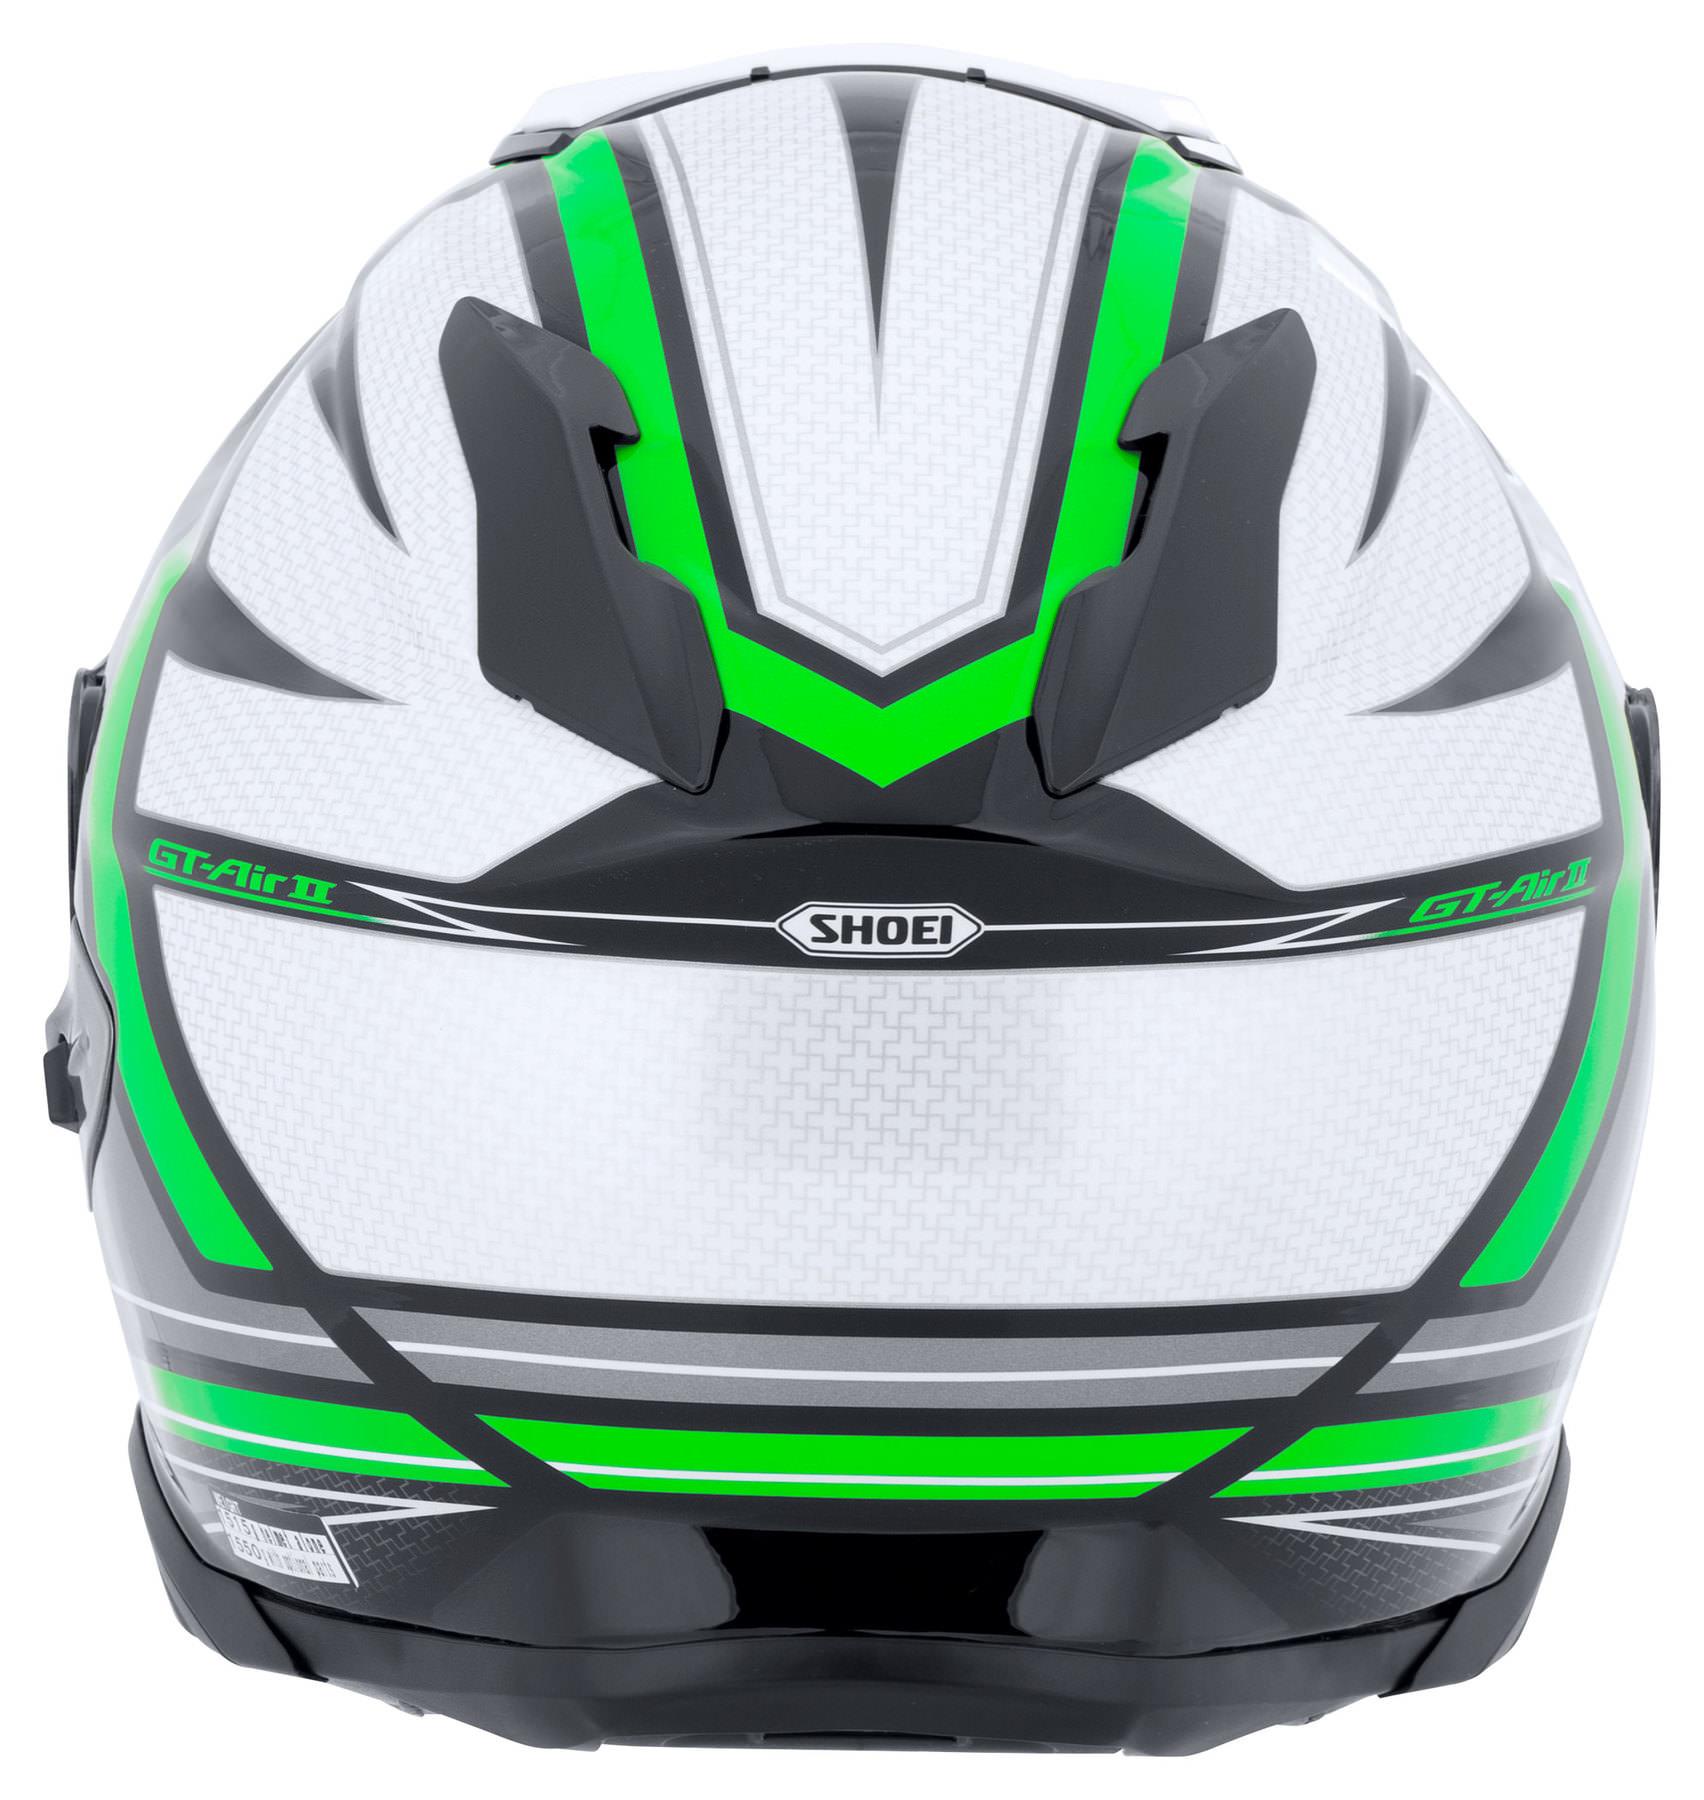 Capacete Shoei GT-Air II Haste TC-4 Cinza/Verde C/ Viseira Solar e Pinlock Anti-Embaçante - GT-Air 2   - Nova Suzuki Motos e Acessórios